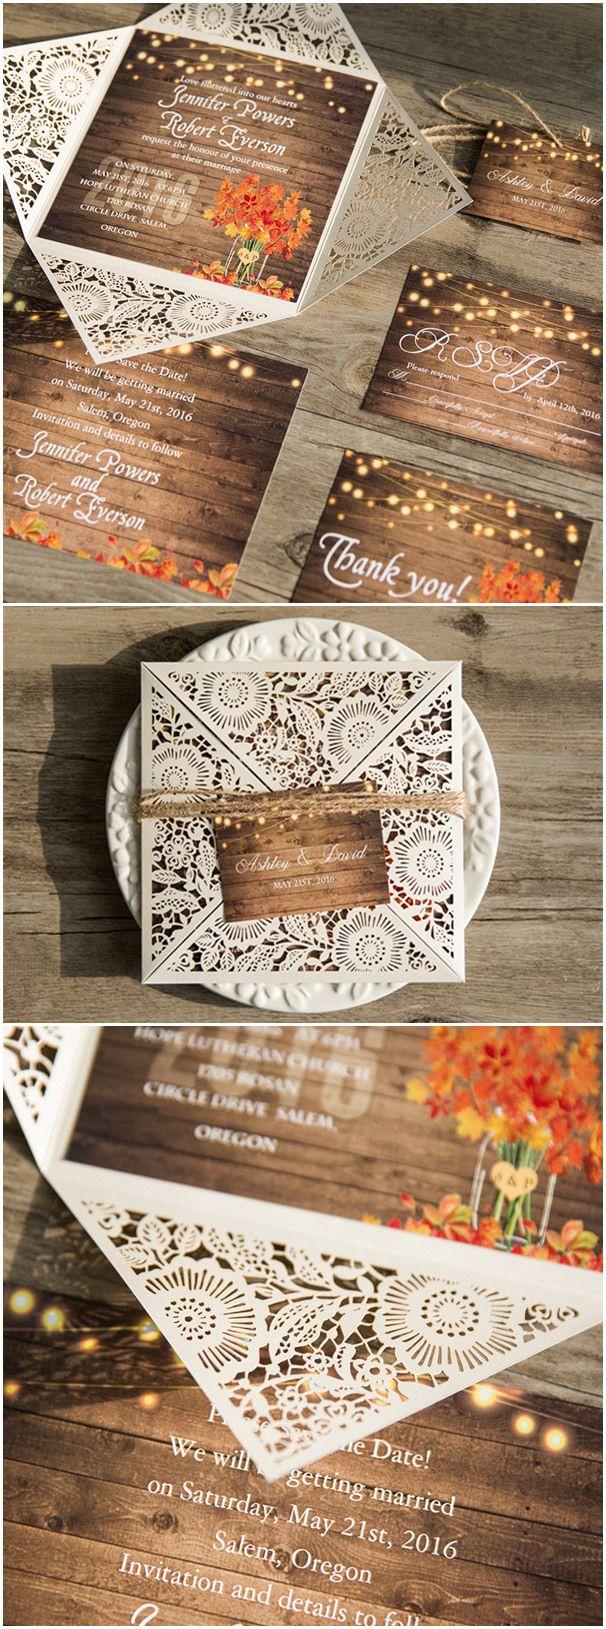 Rustic Fall Wedding Invitations Rustic Fall Wedding Invitations Rustic Fall Wedding Invitations